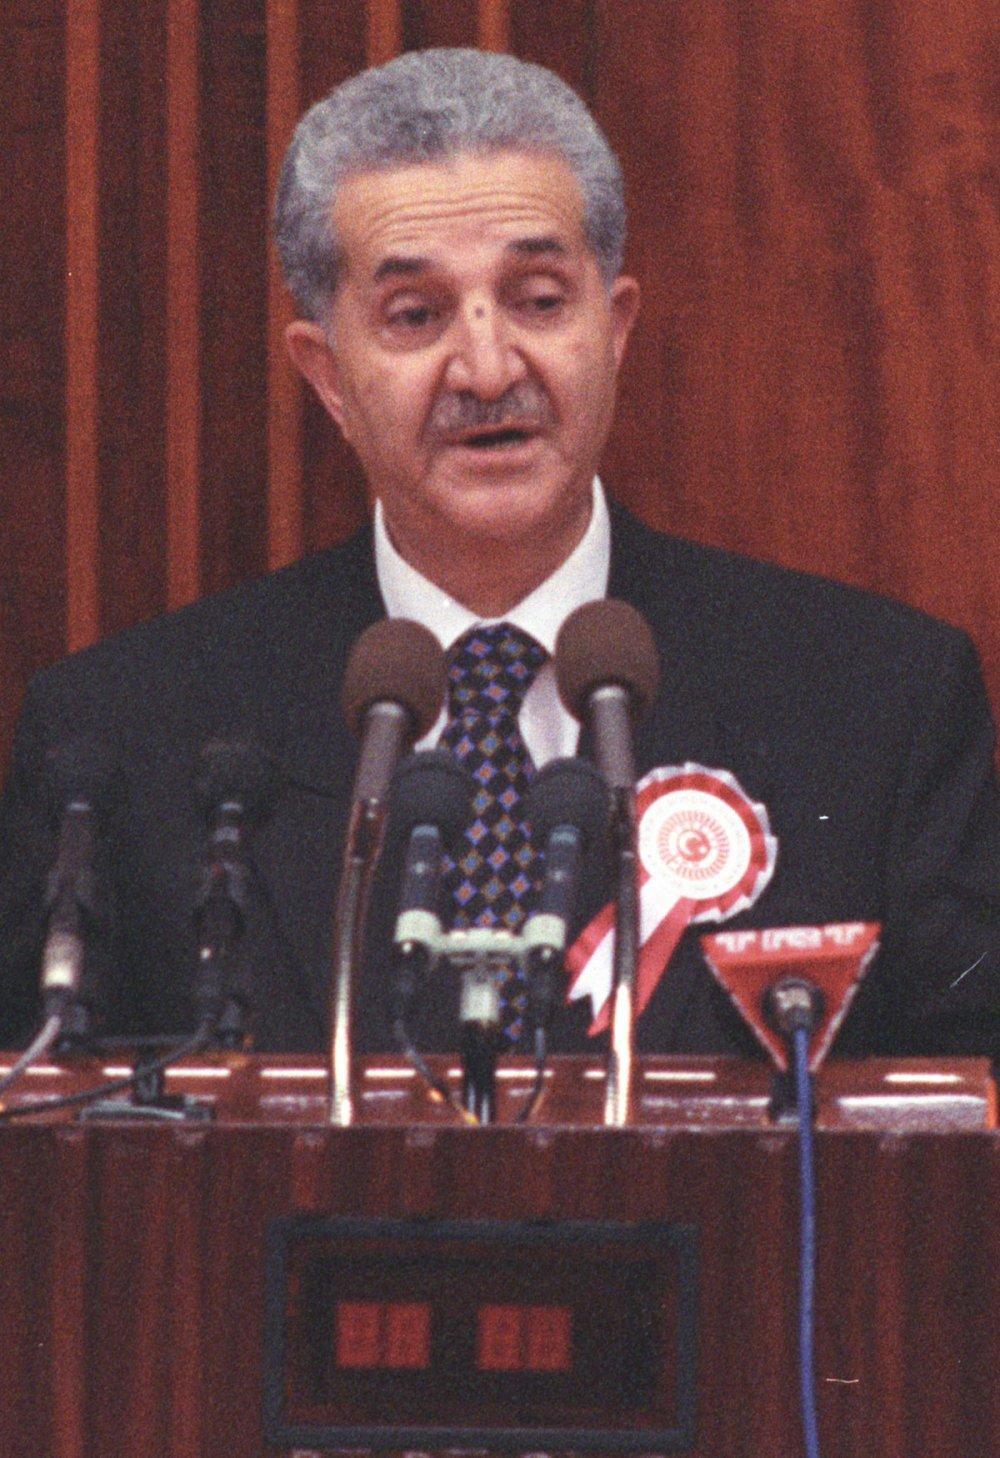 Eski Refah Partisi Genel Başkanı Ahmet Tekdal